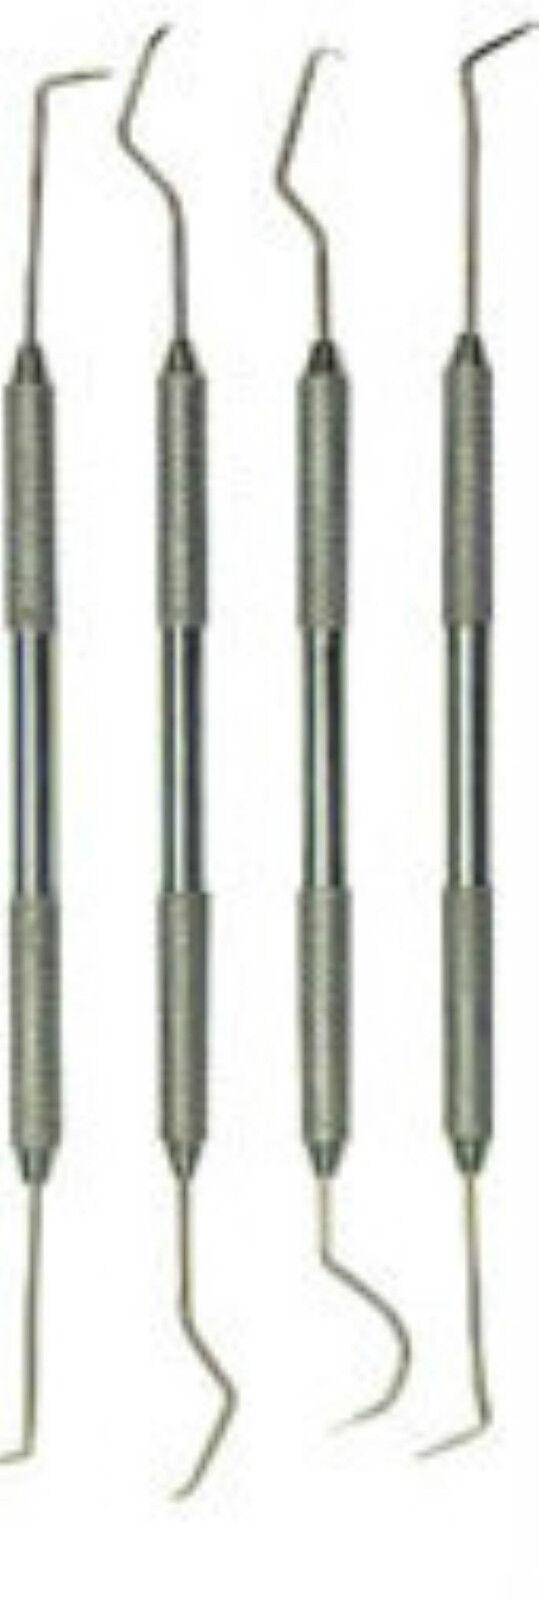 4pc Dental Picks Probe Wax Carver Set Stainless Steel #Dd310c Us Free Fast Ship